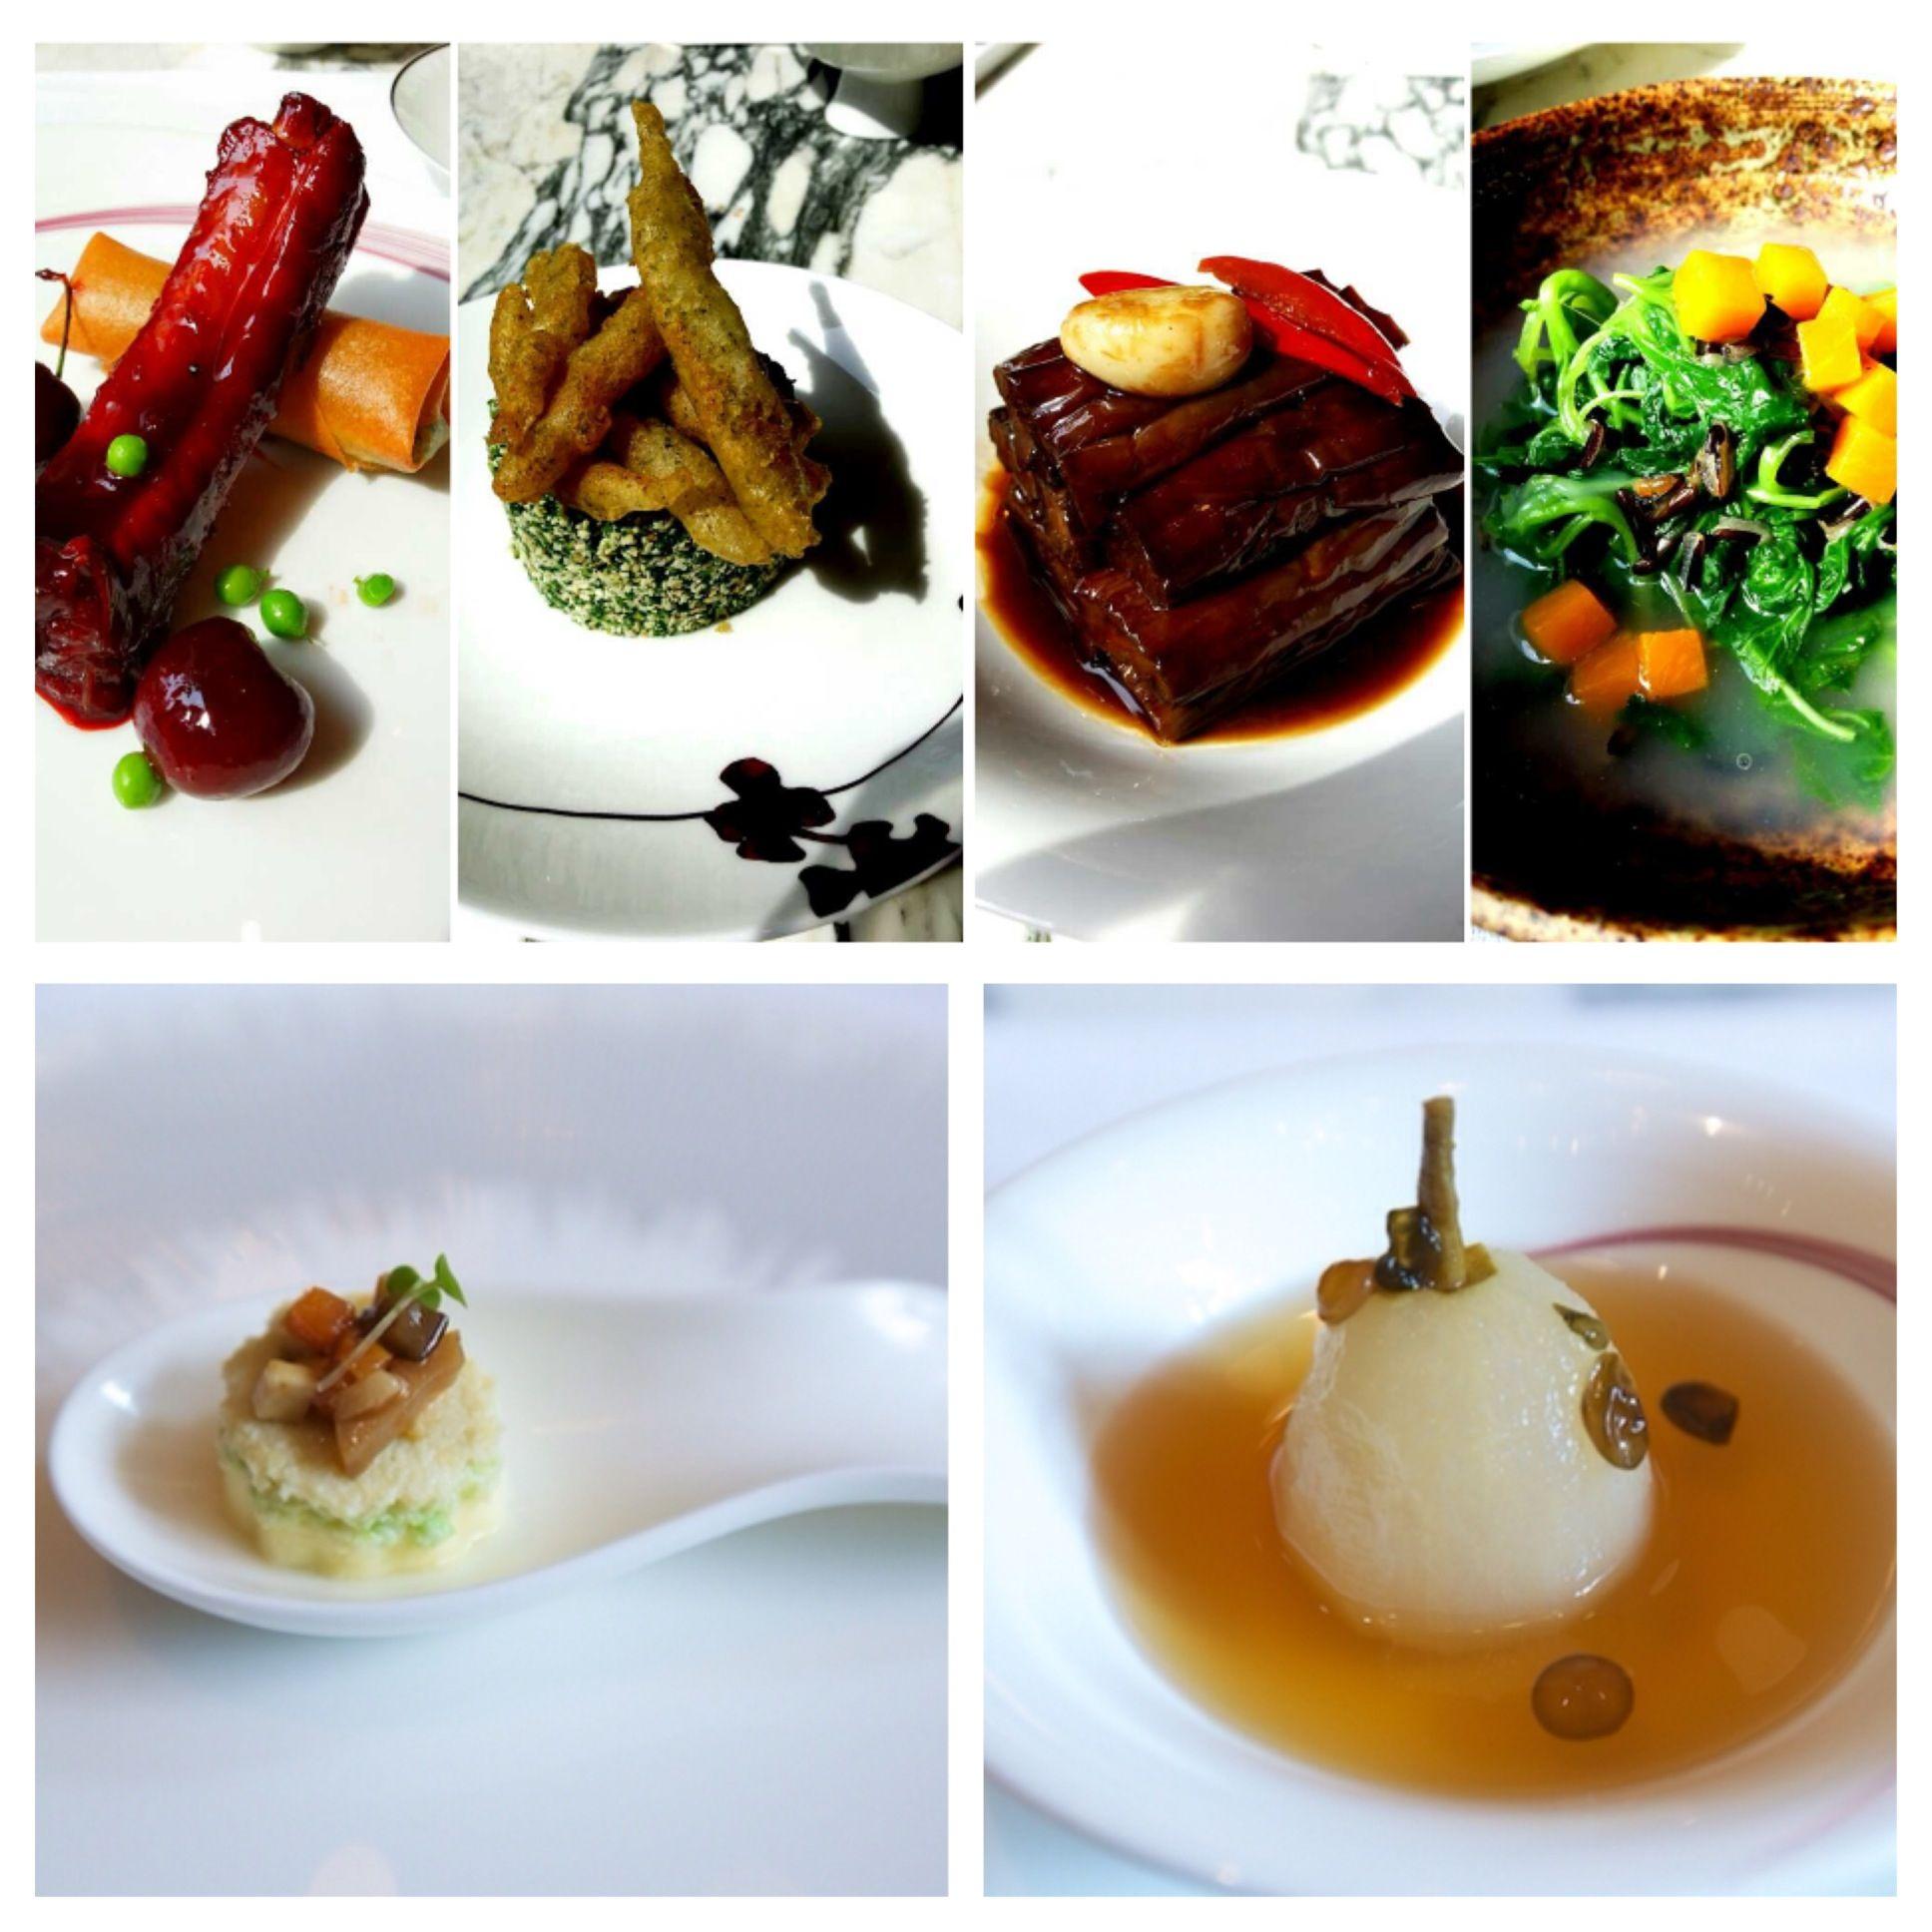 Irresistible springtime specialties of yong yi ting